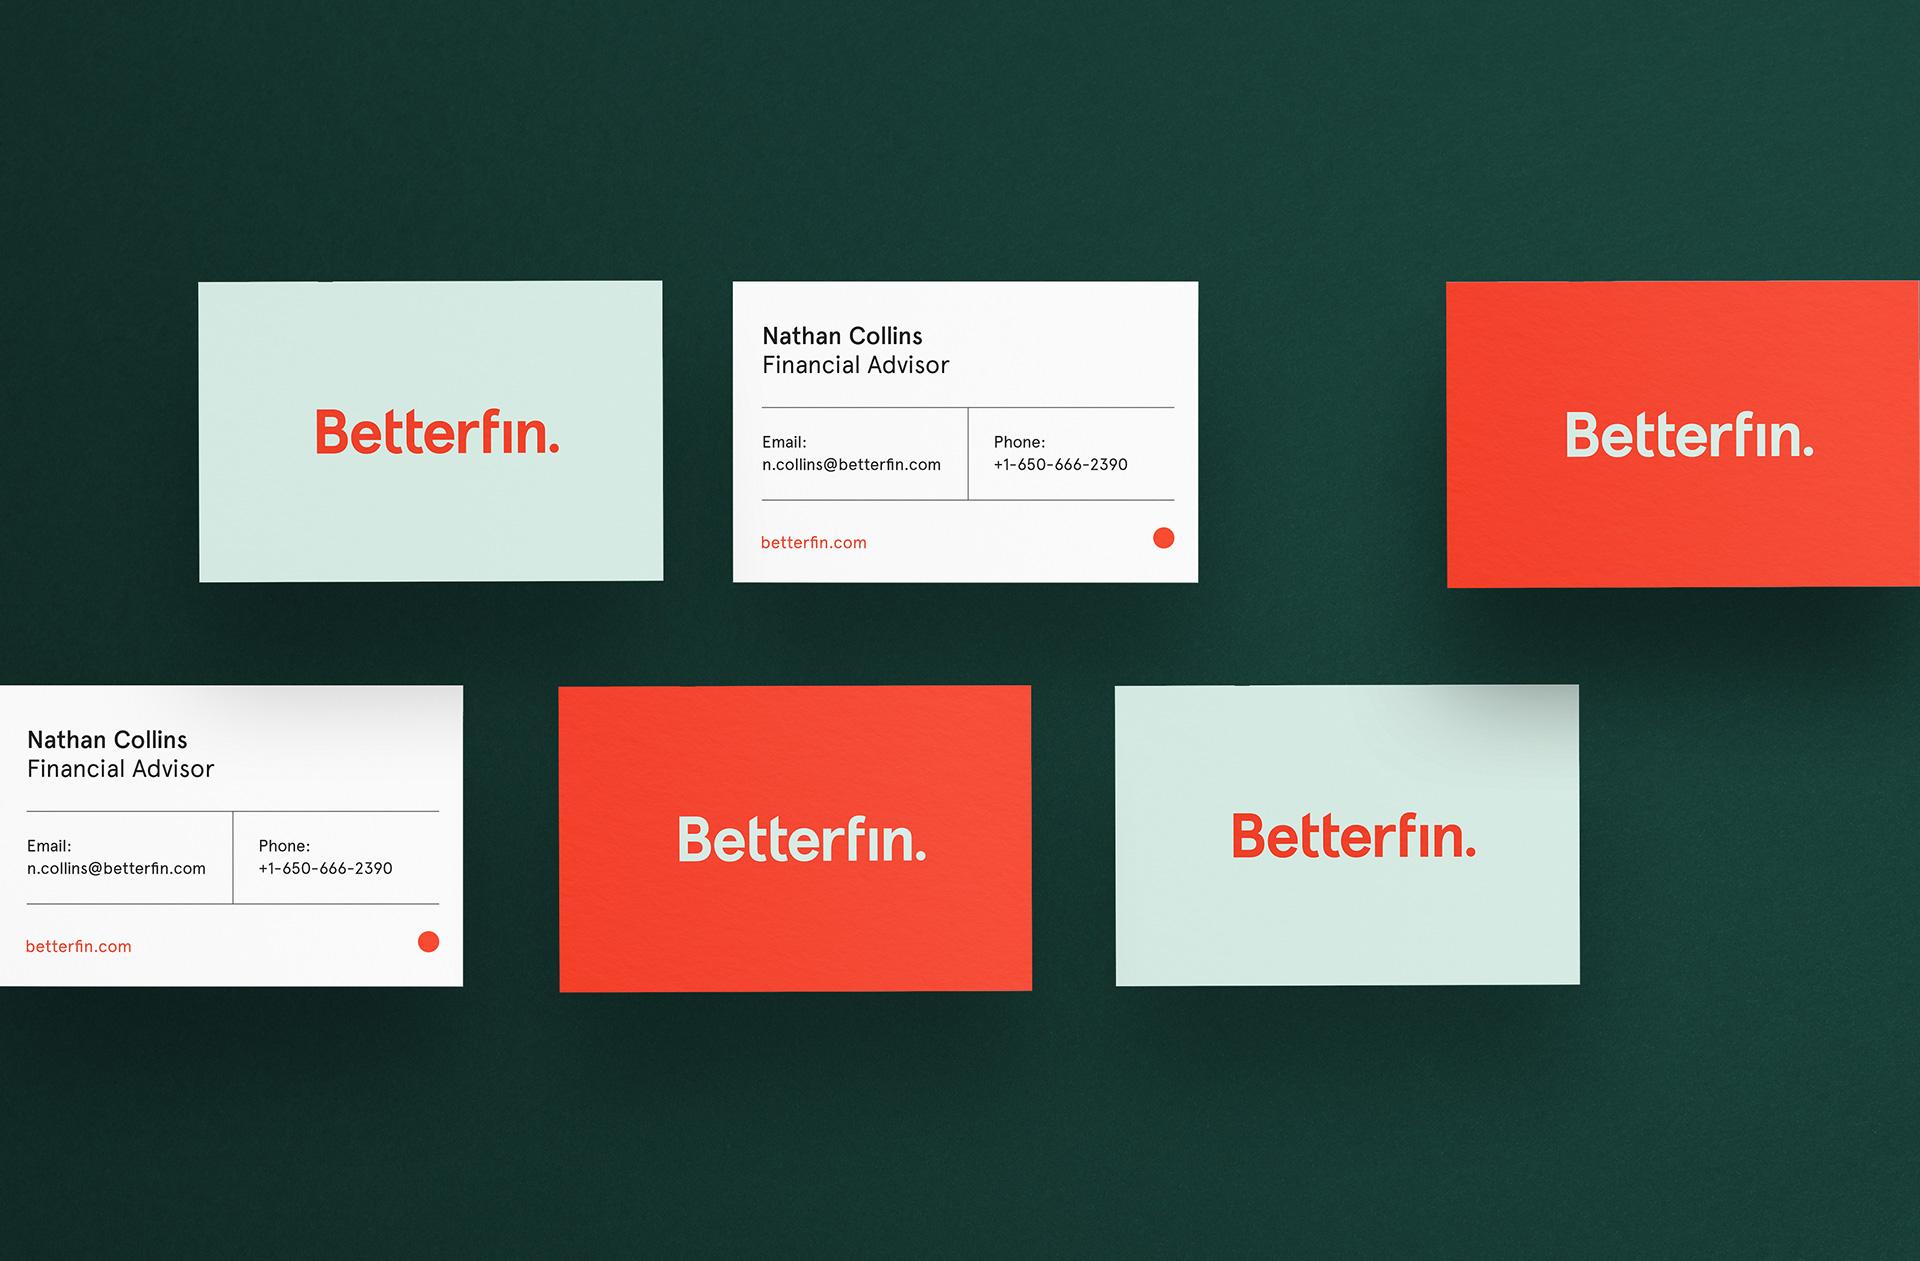 Betterfin - Case - Study - Paperwork